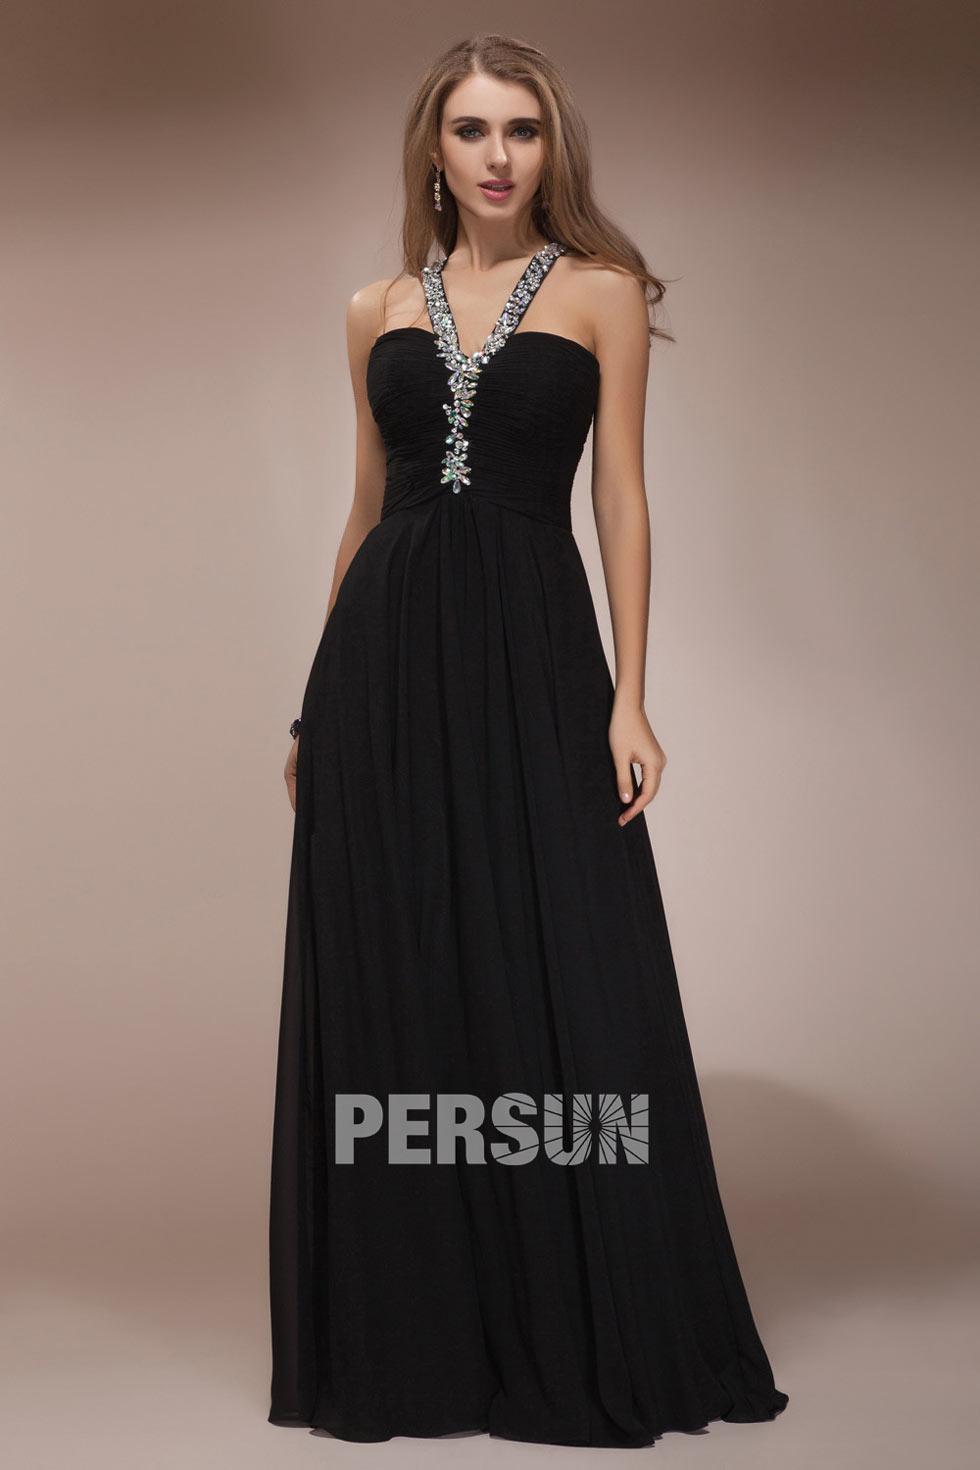 Robe noire bal col V rétro ornée de strass avec bretelles